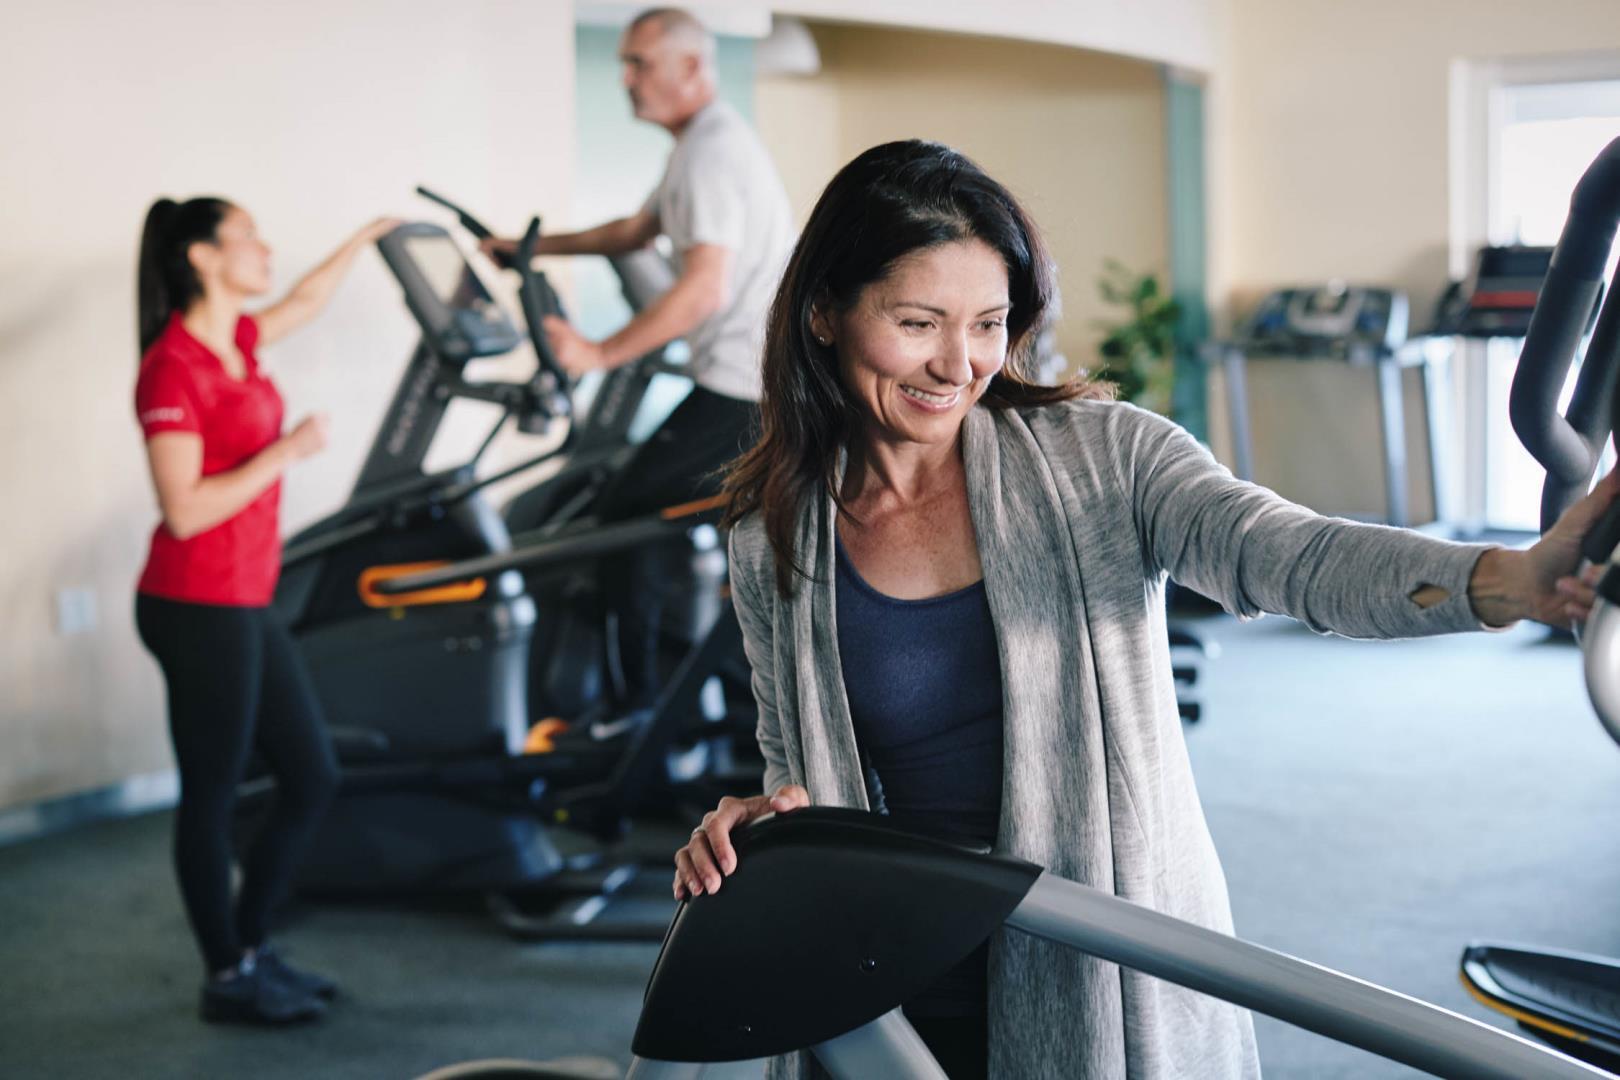 Johnson Fitness & Wellness - West Palm Beach, FL